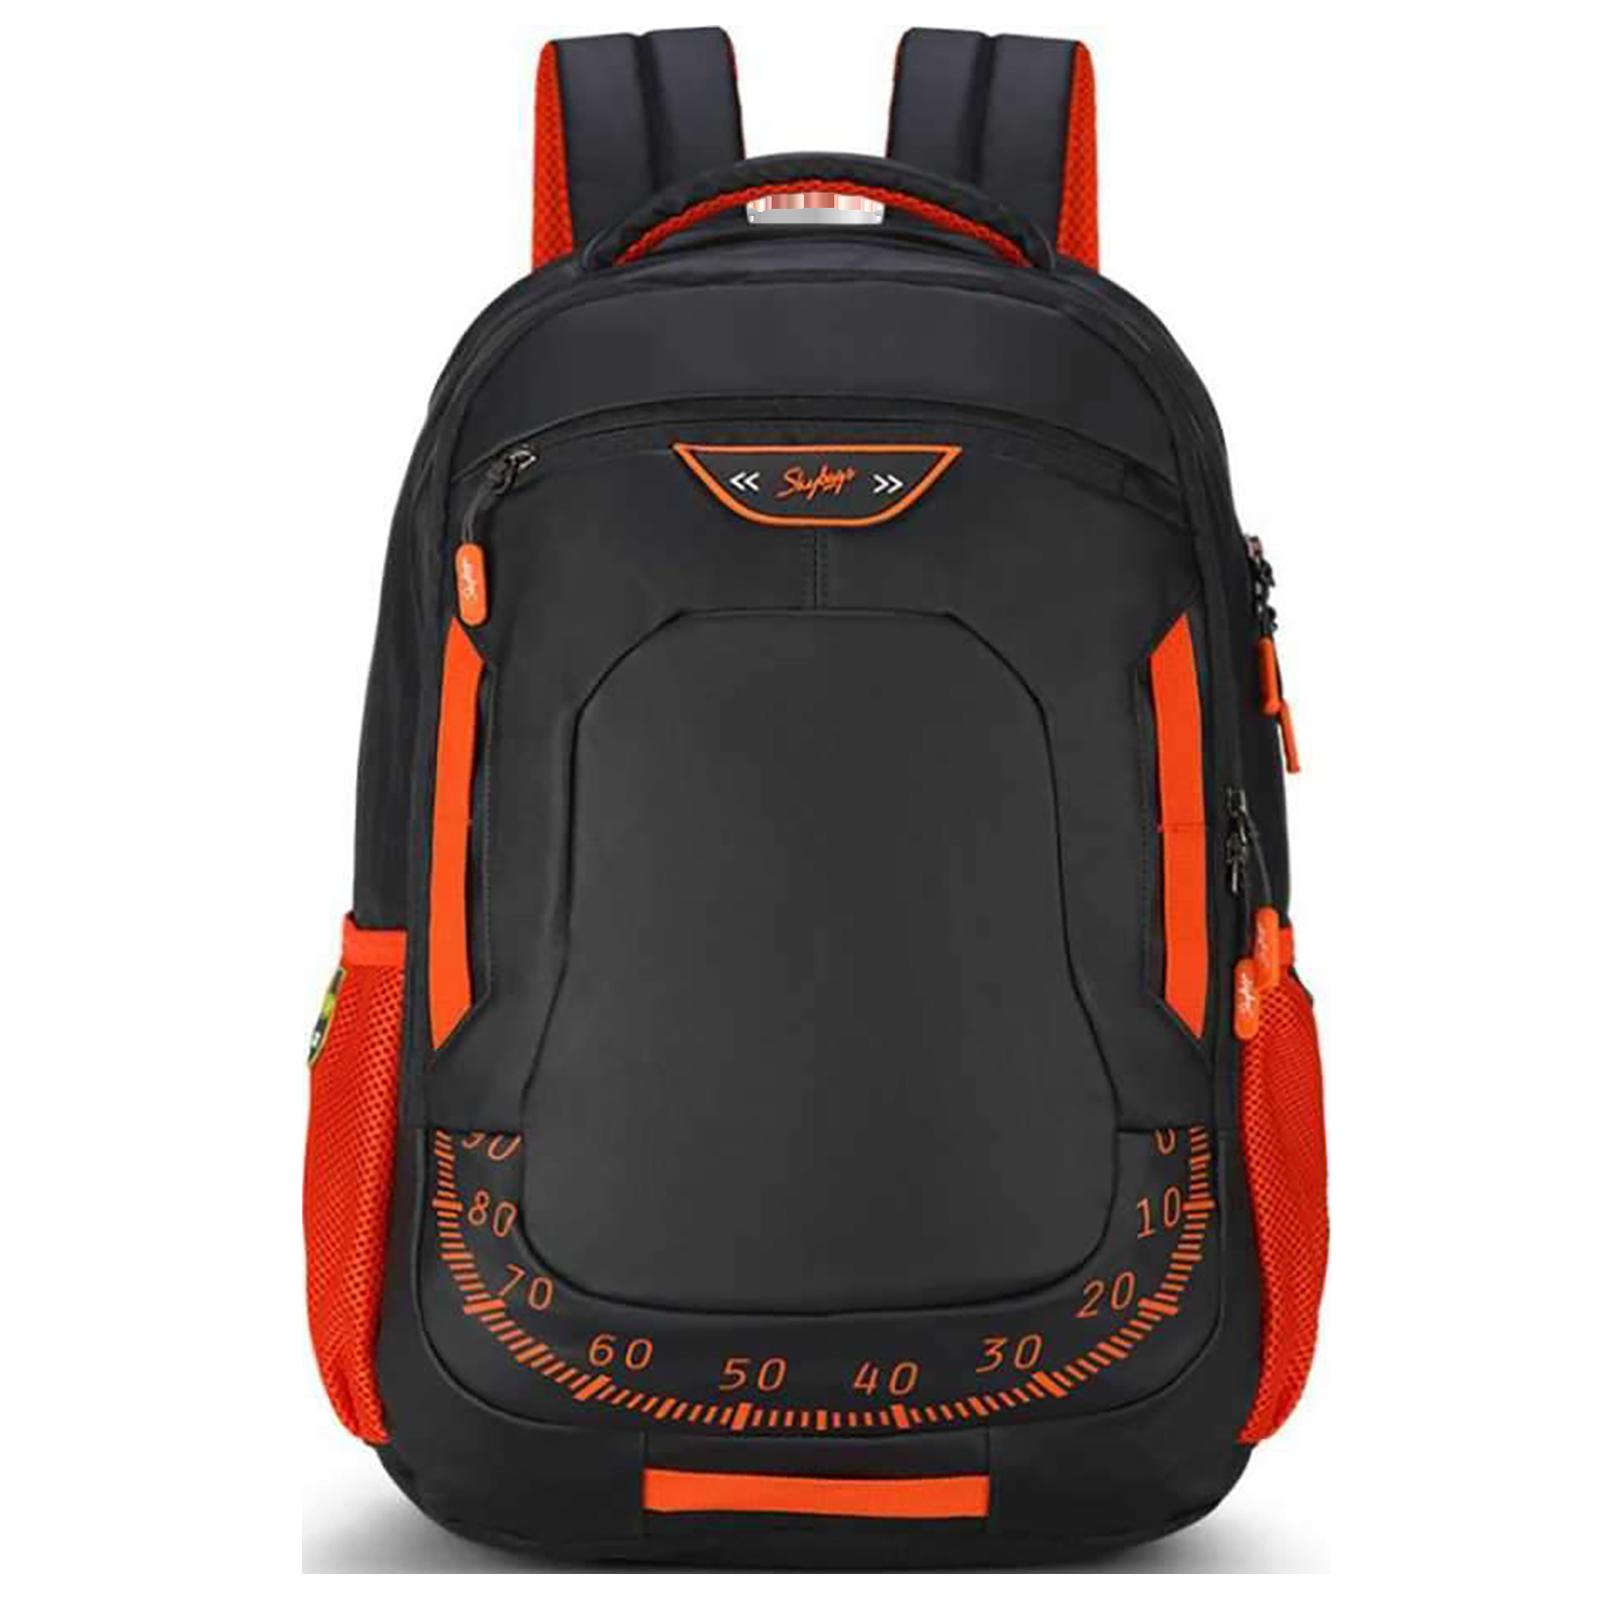 Sky Bags Skater 03 30 Litres Gucci Backpack for 15 Inch Laptop (Rain Cover, LPBPSK3BLK, Black)_1